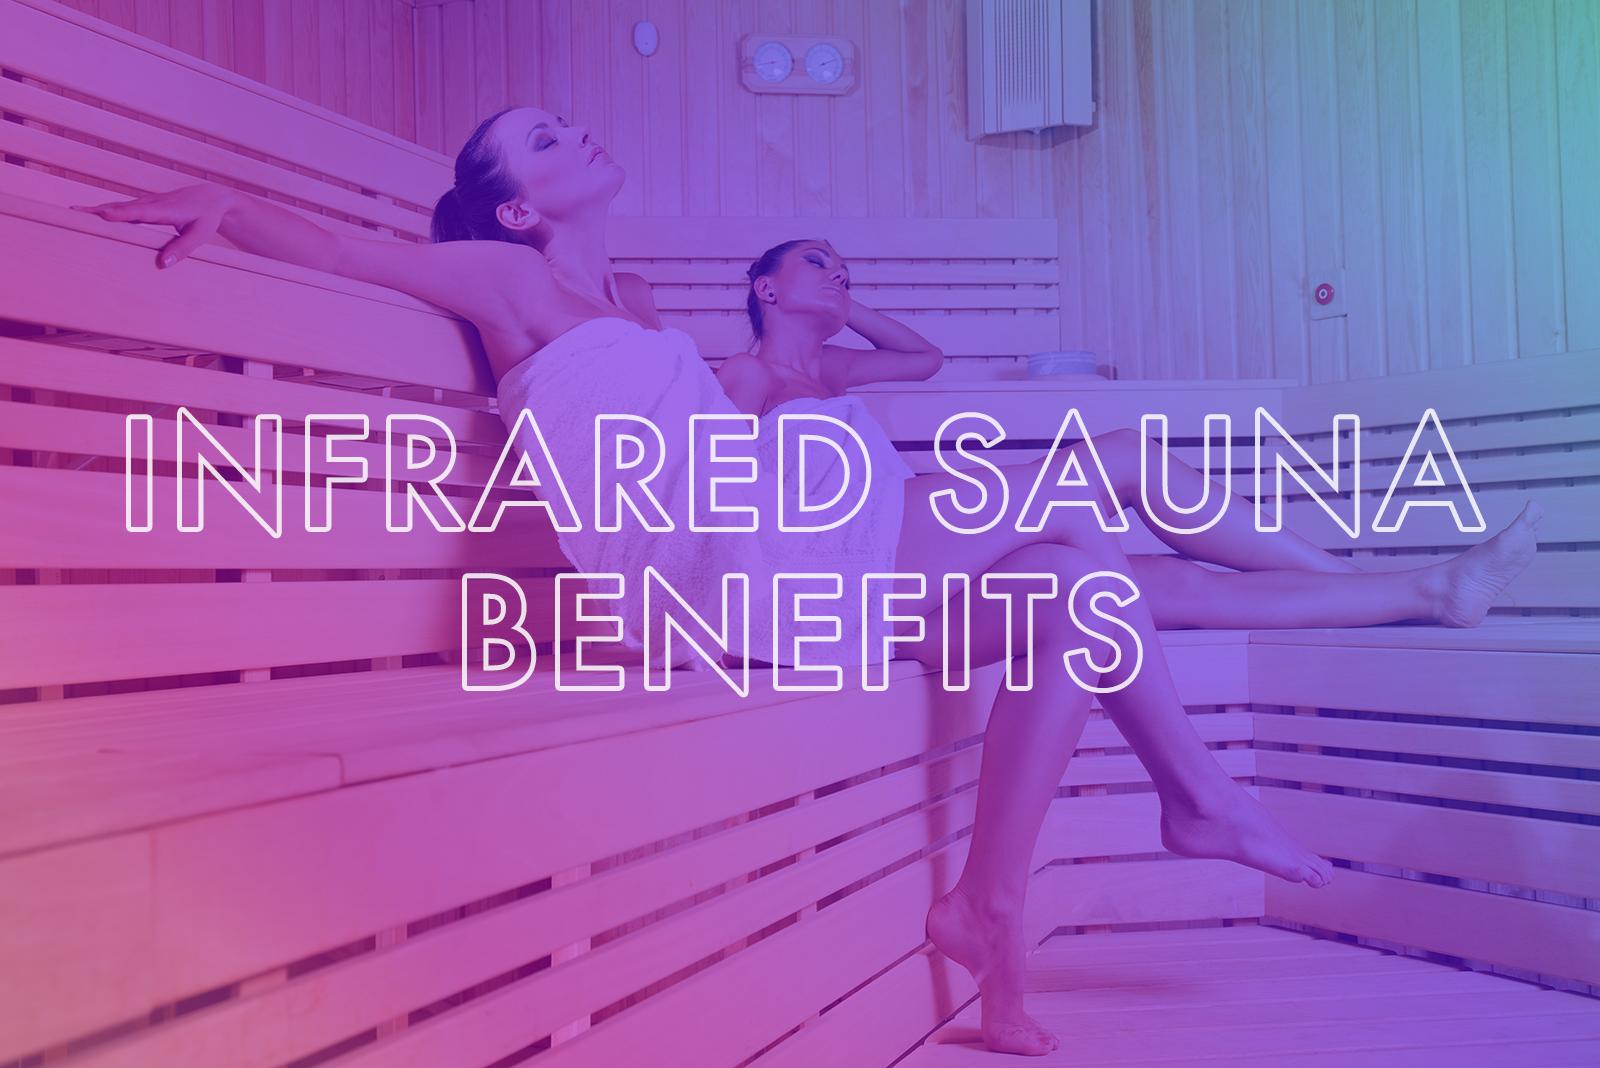 infrared sauna benefits.png